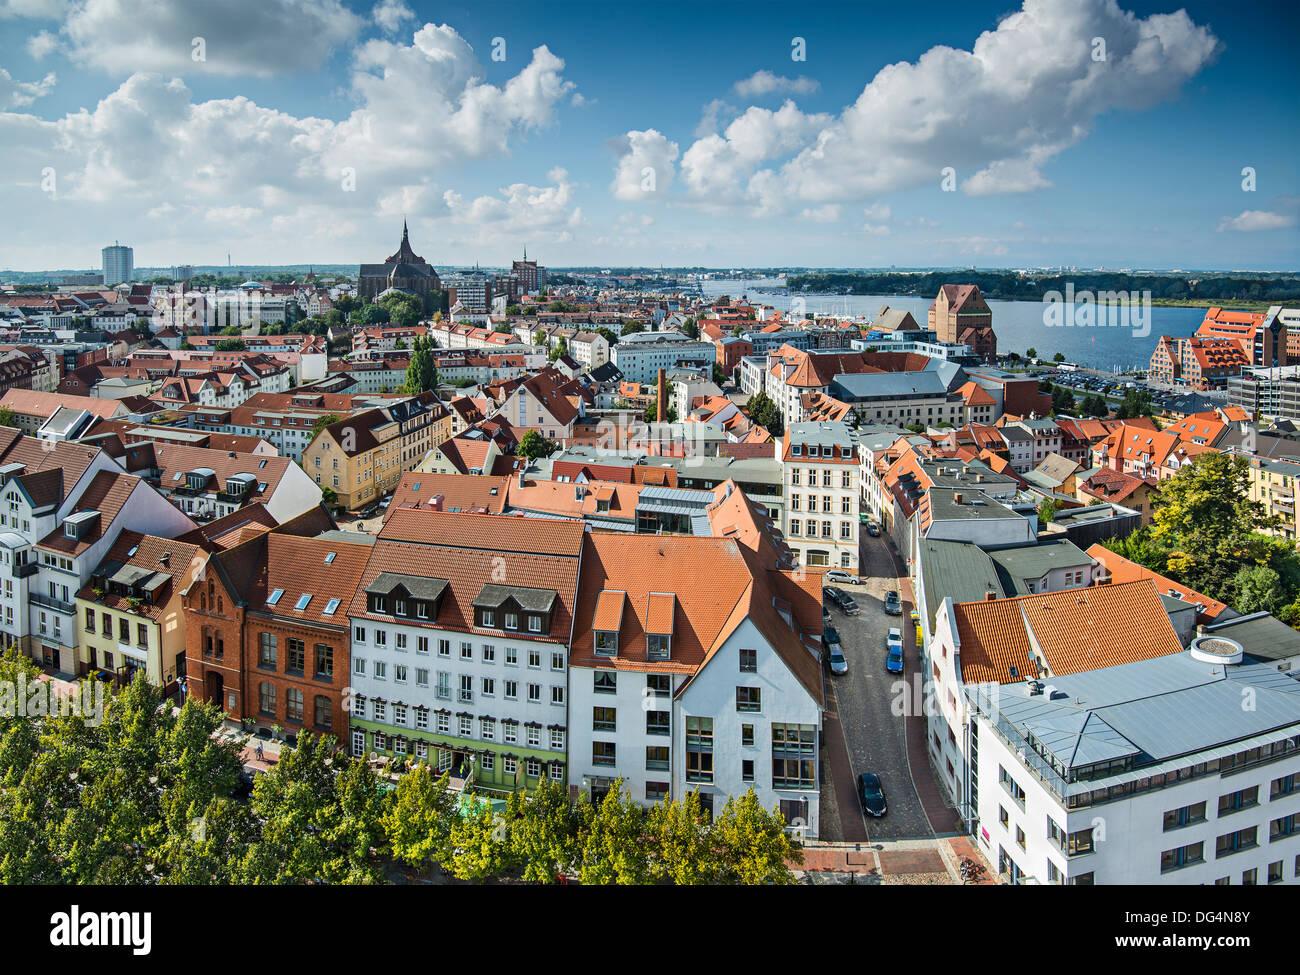 Rostock, Germany city skyline. - Stock Image